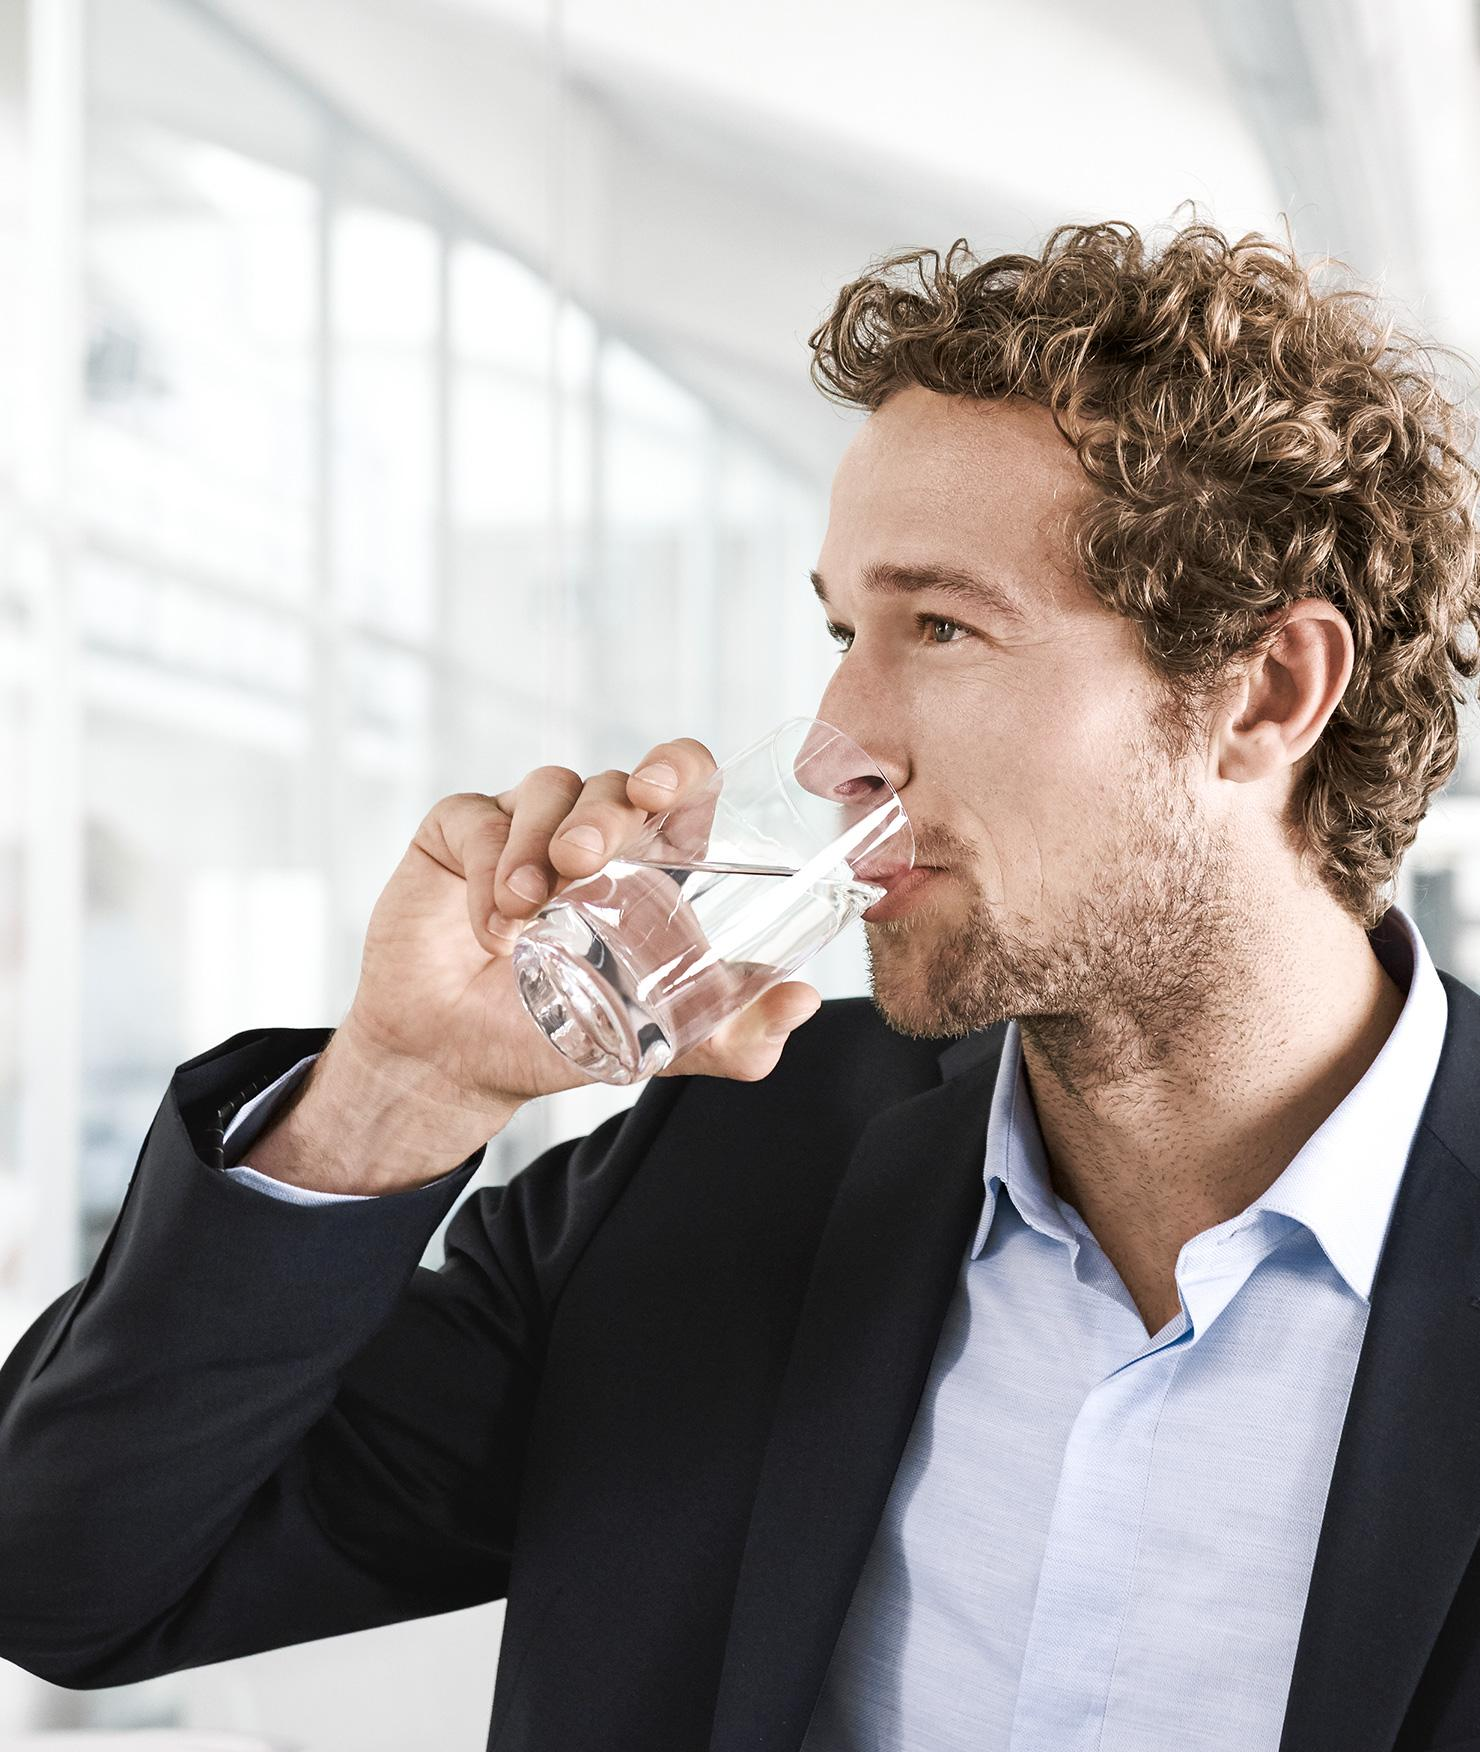 BRITA filter HS1 office man drink close-up